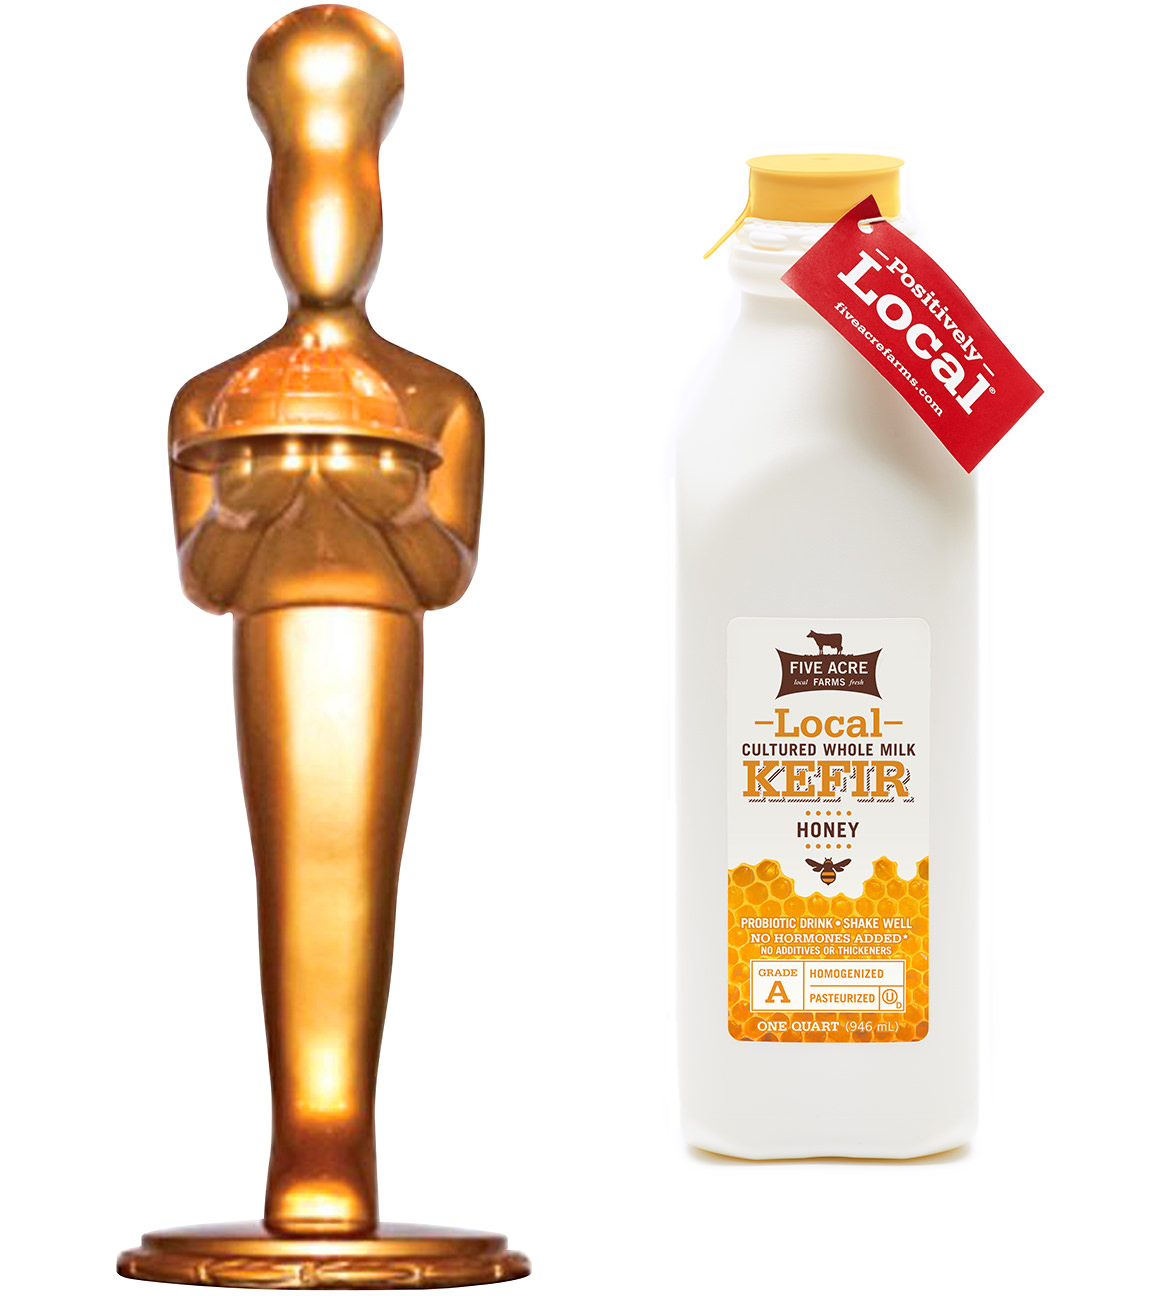 Award winning kefir - Sofi Award